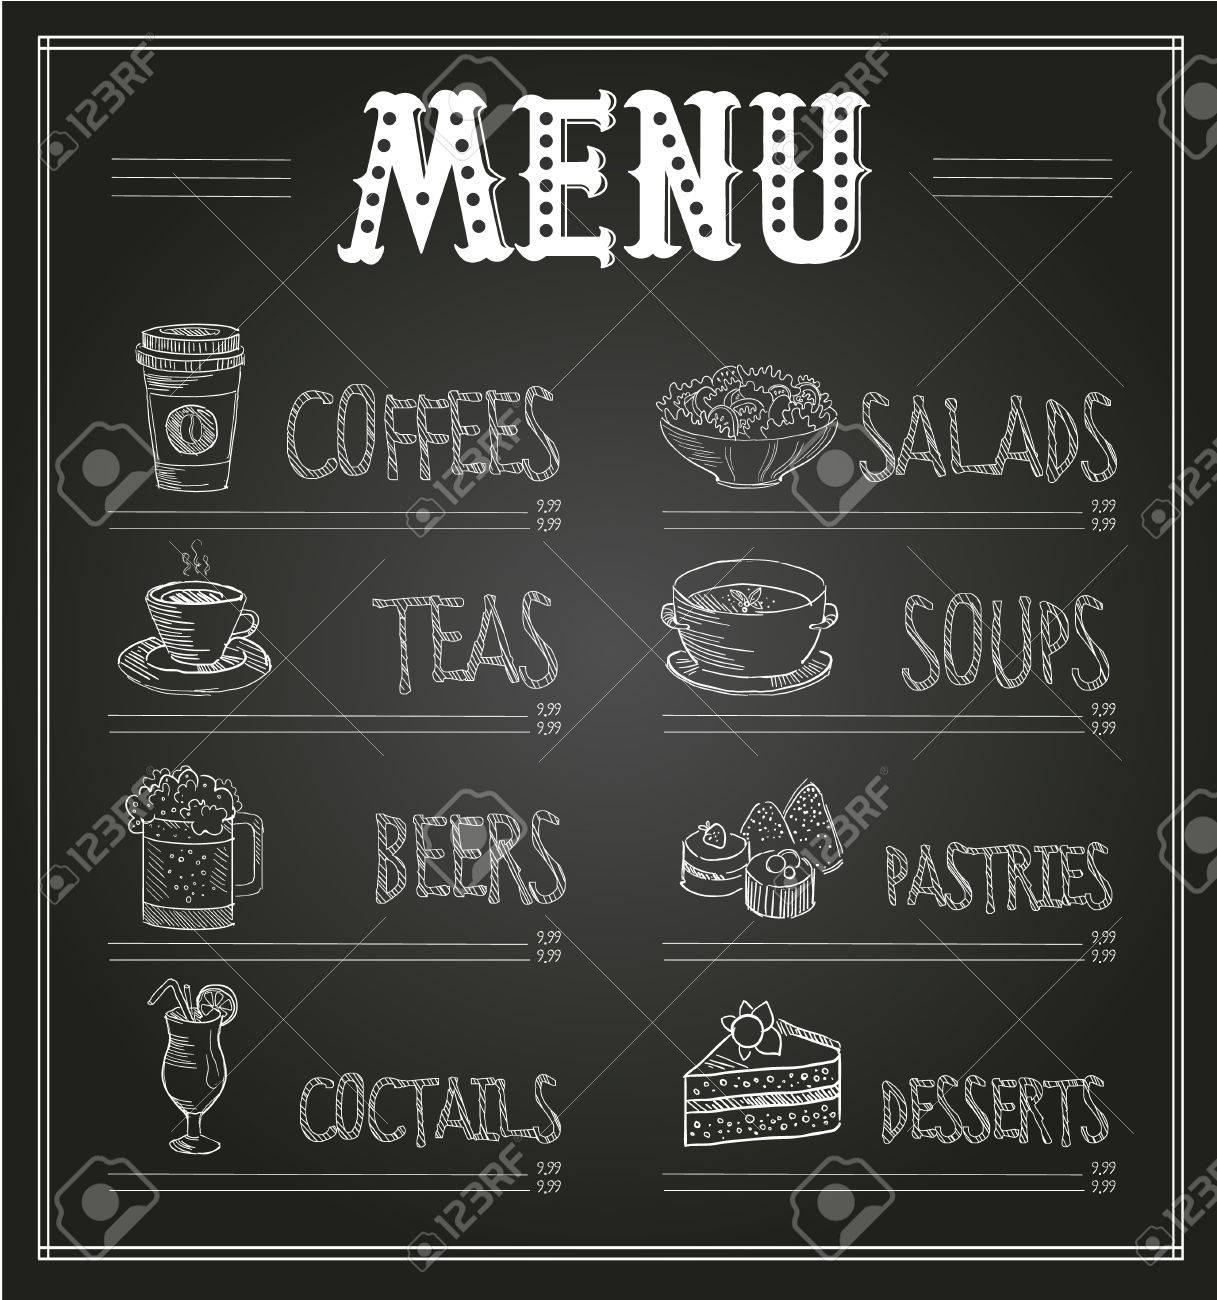 Sample Chalkboard Menu Template Famous Restaurant Menu Templates Word  Contemporary Professional 61